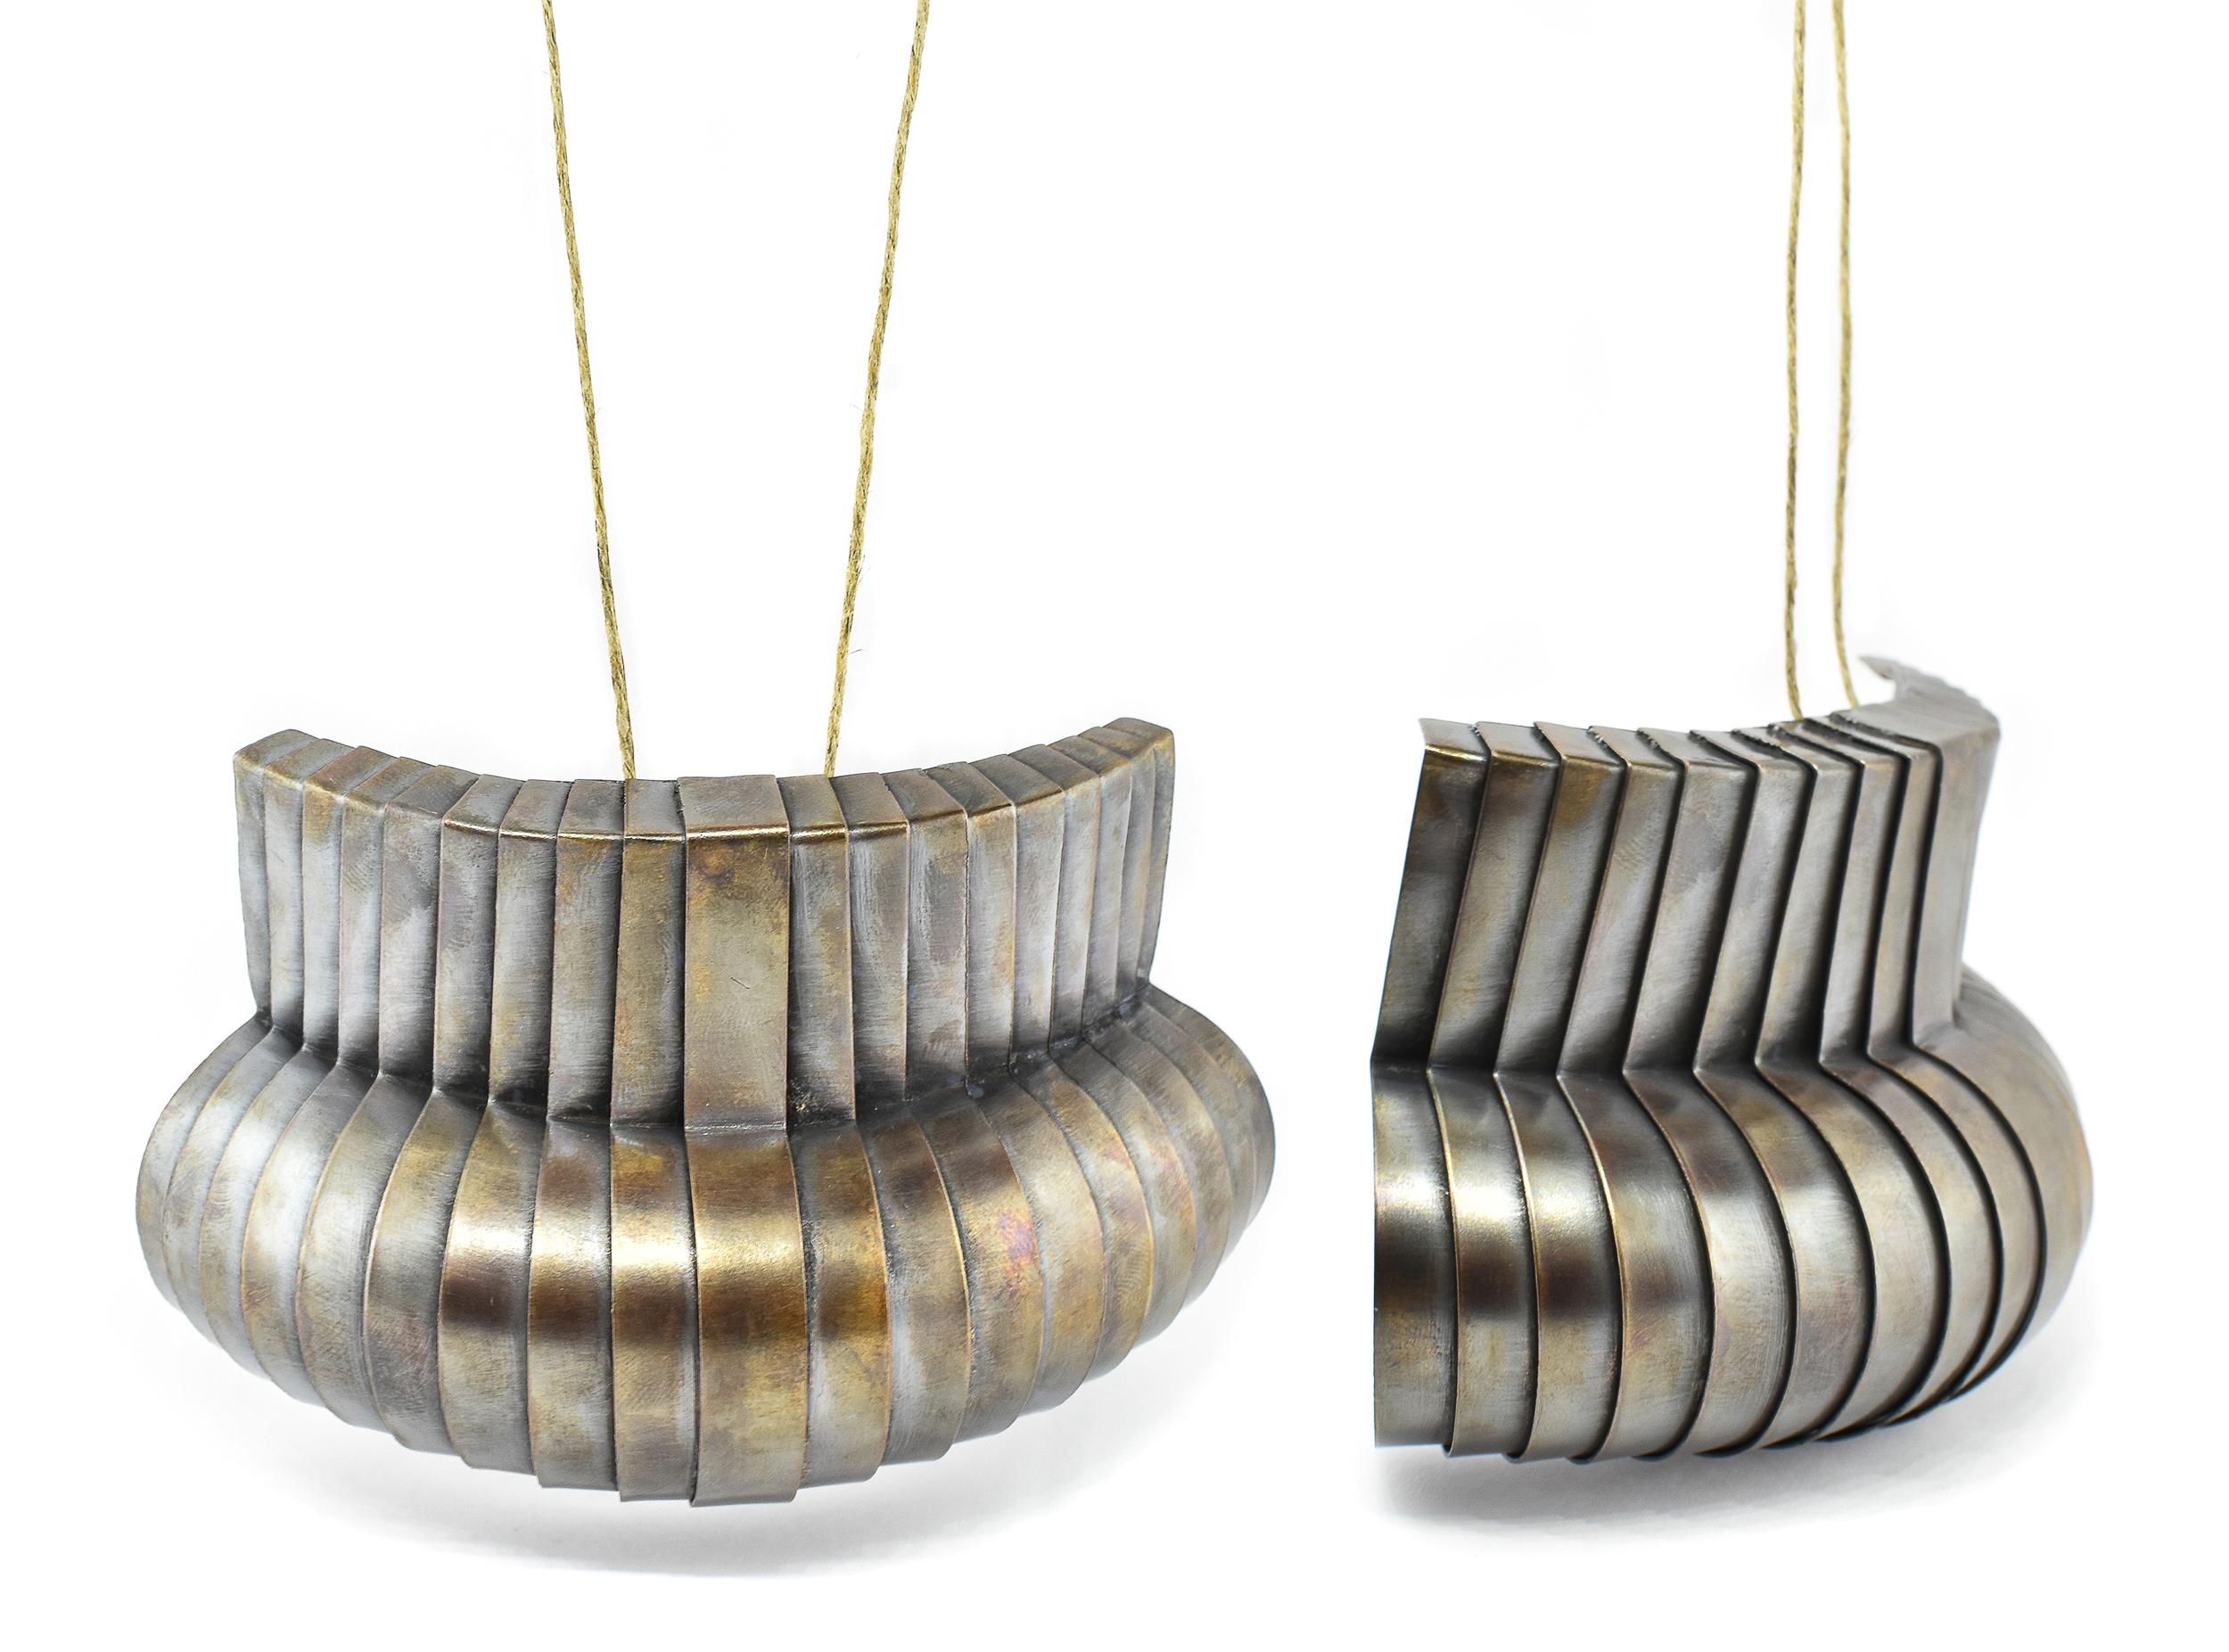 Expanded Vessel Pendant